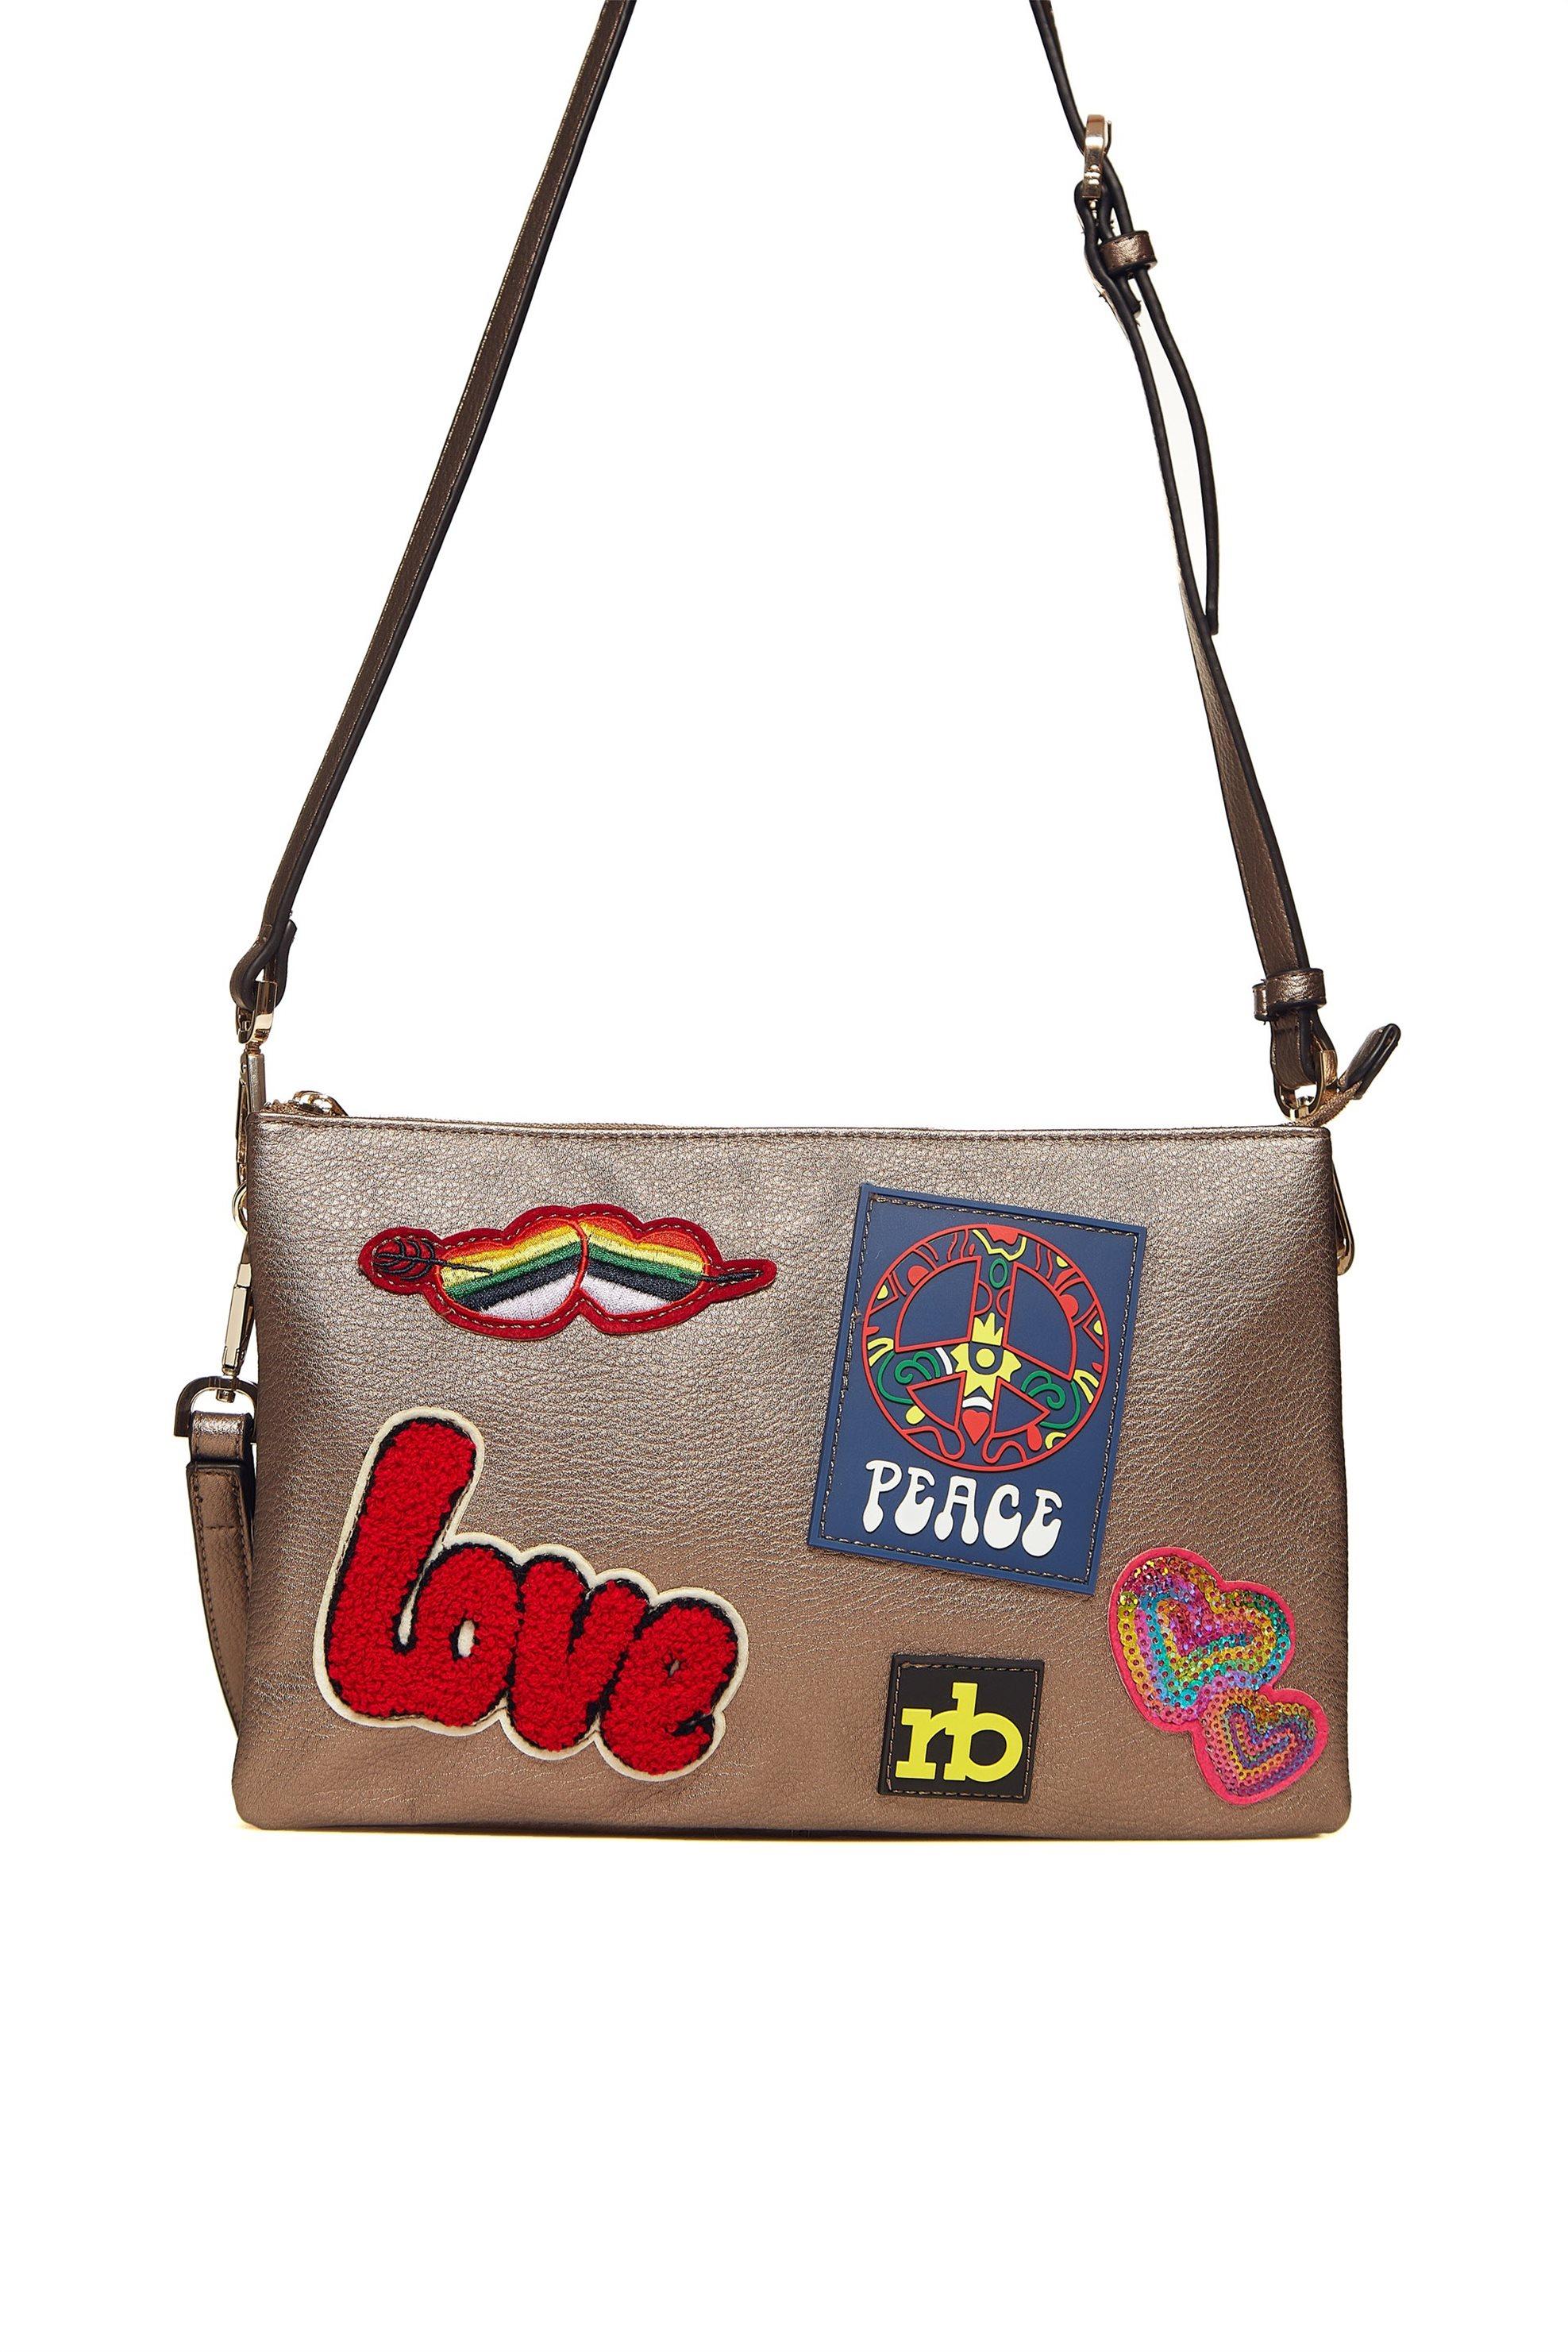 309e8a470d Roccobarocco γυναικεία τσάντα crossbody με patches - 01GRBBS1O203 JA -  Μπρονζέ